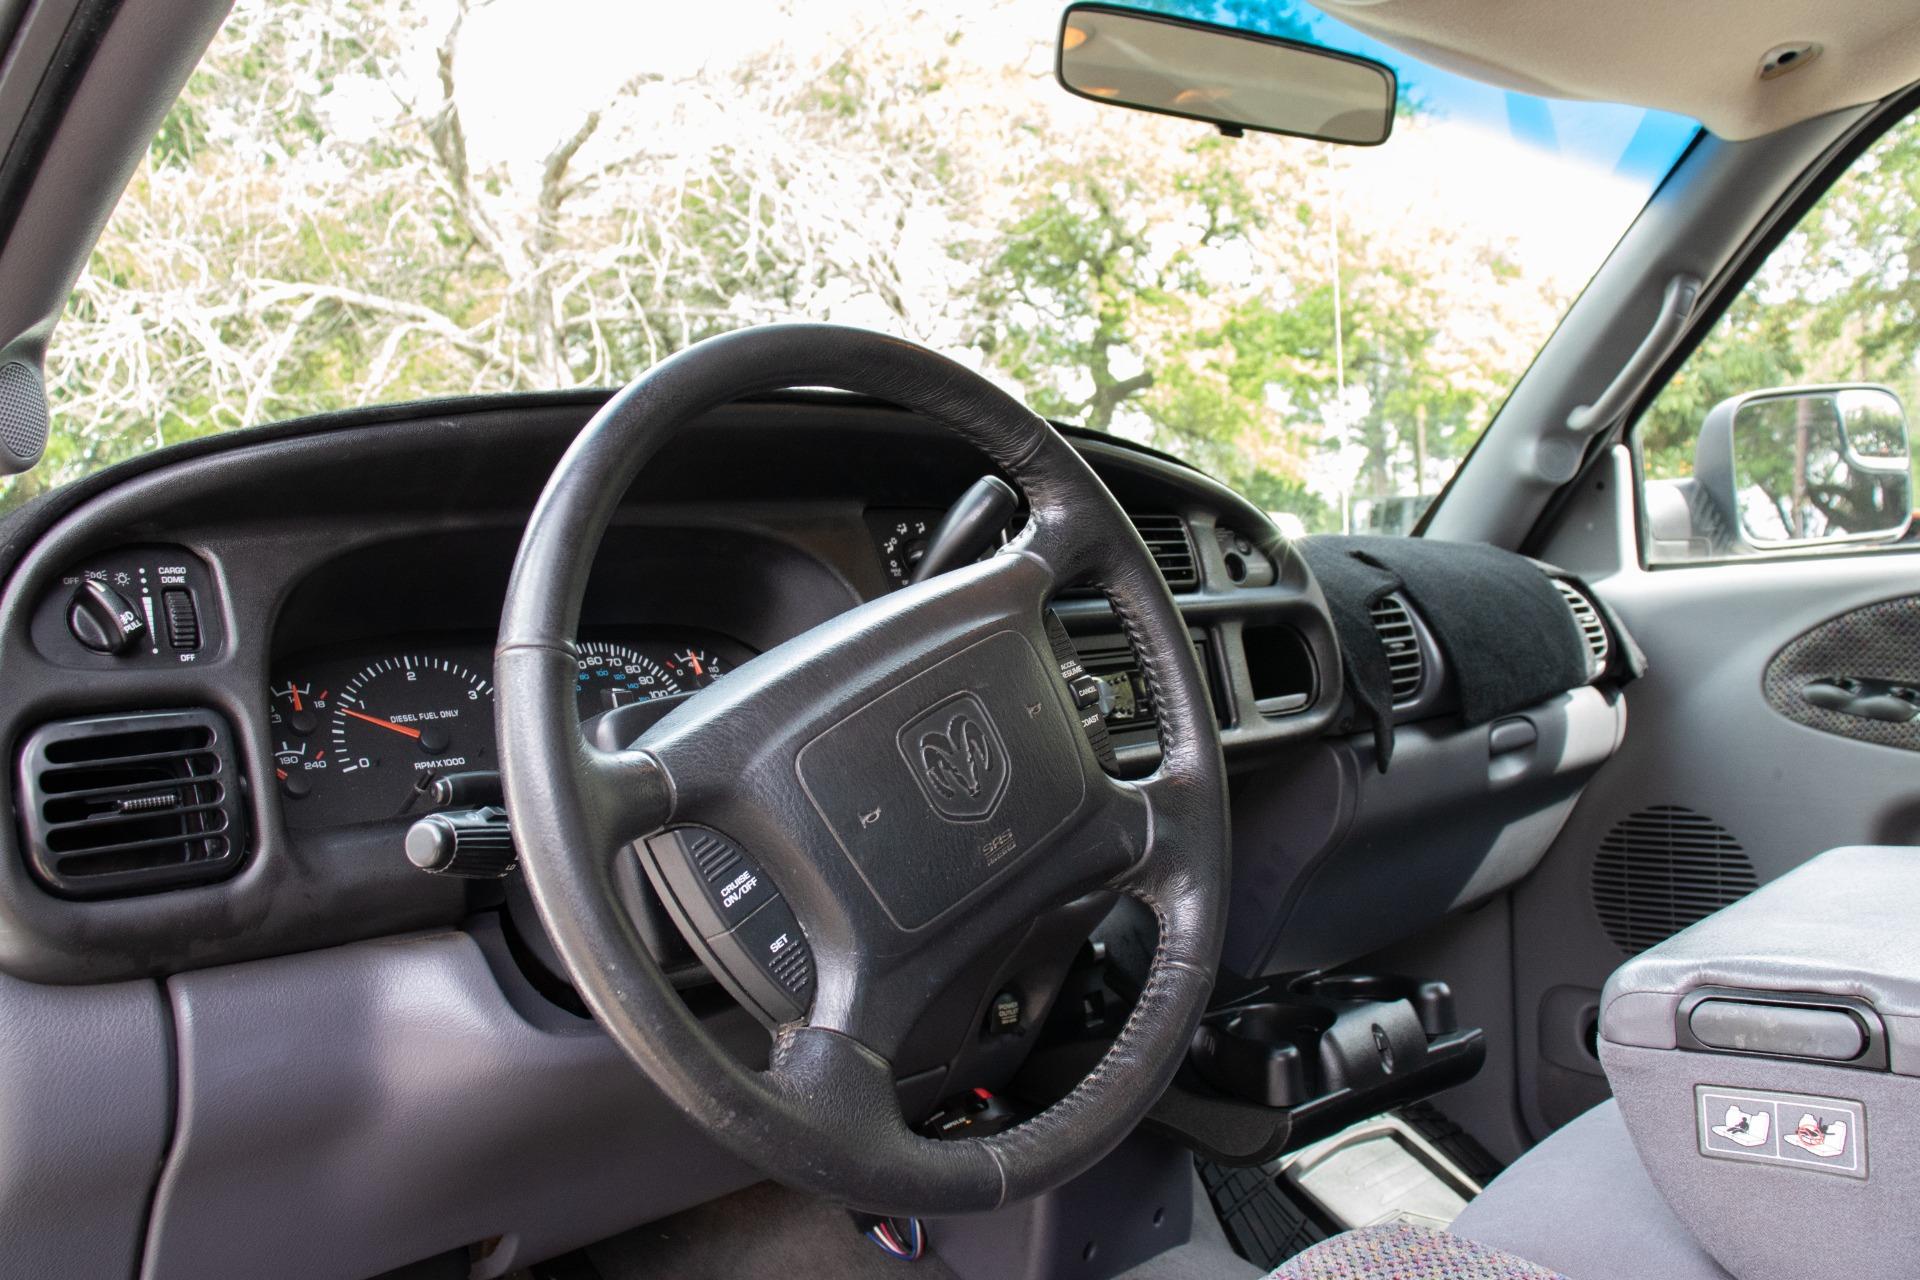 Used-2001-Dodge-Ram-Pickup-3500-DRW-SLT